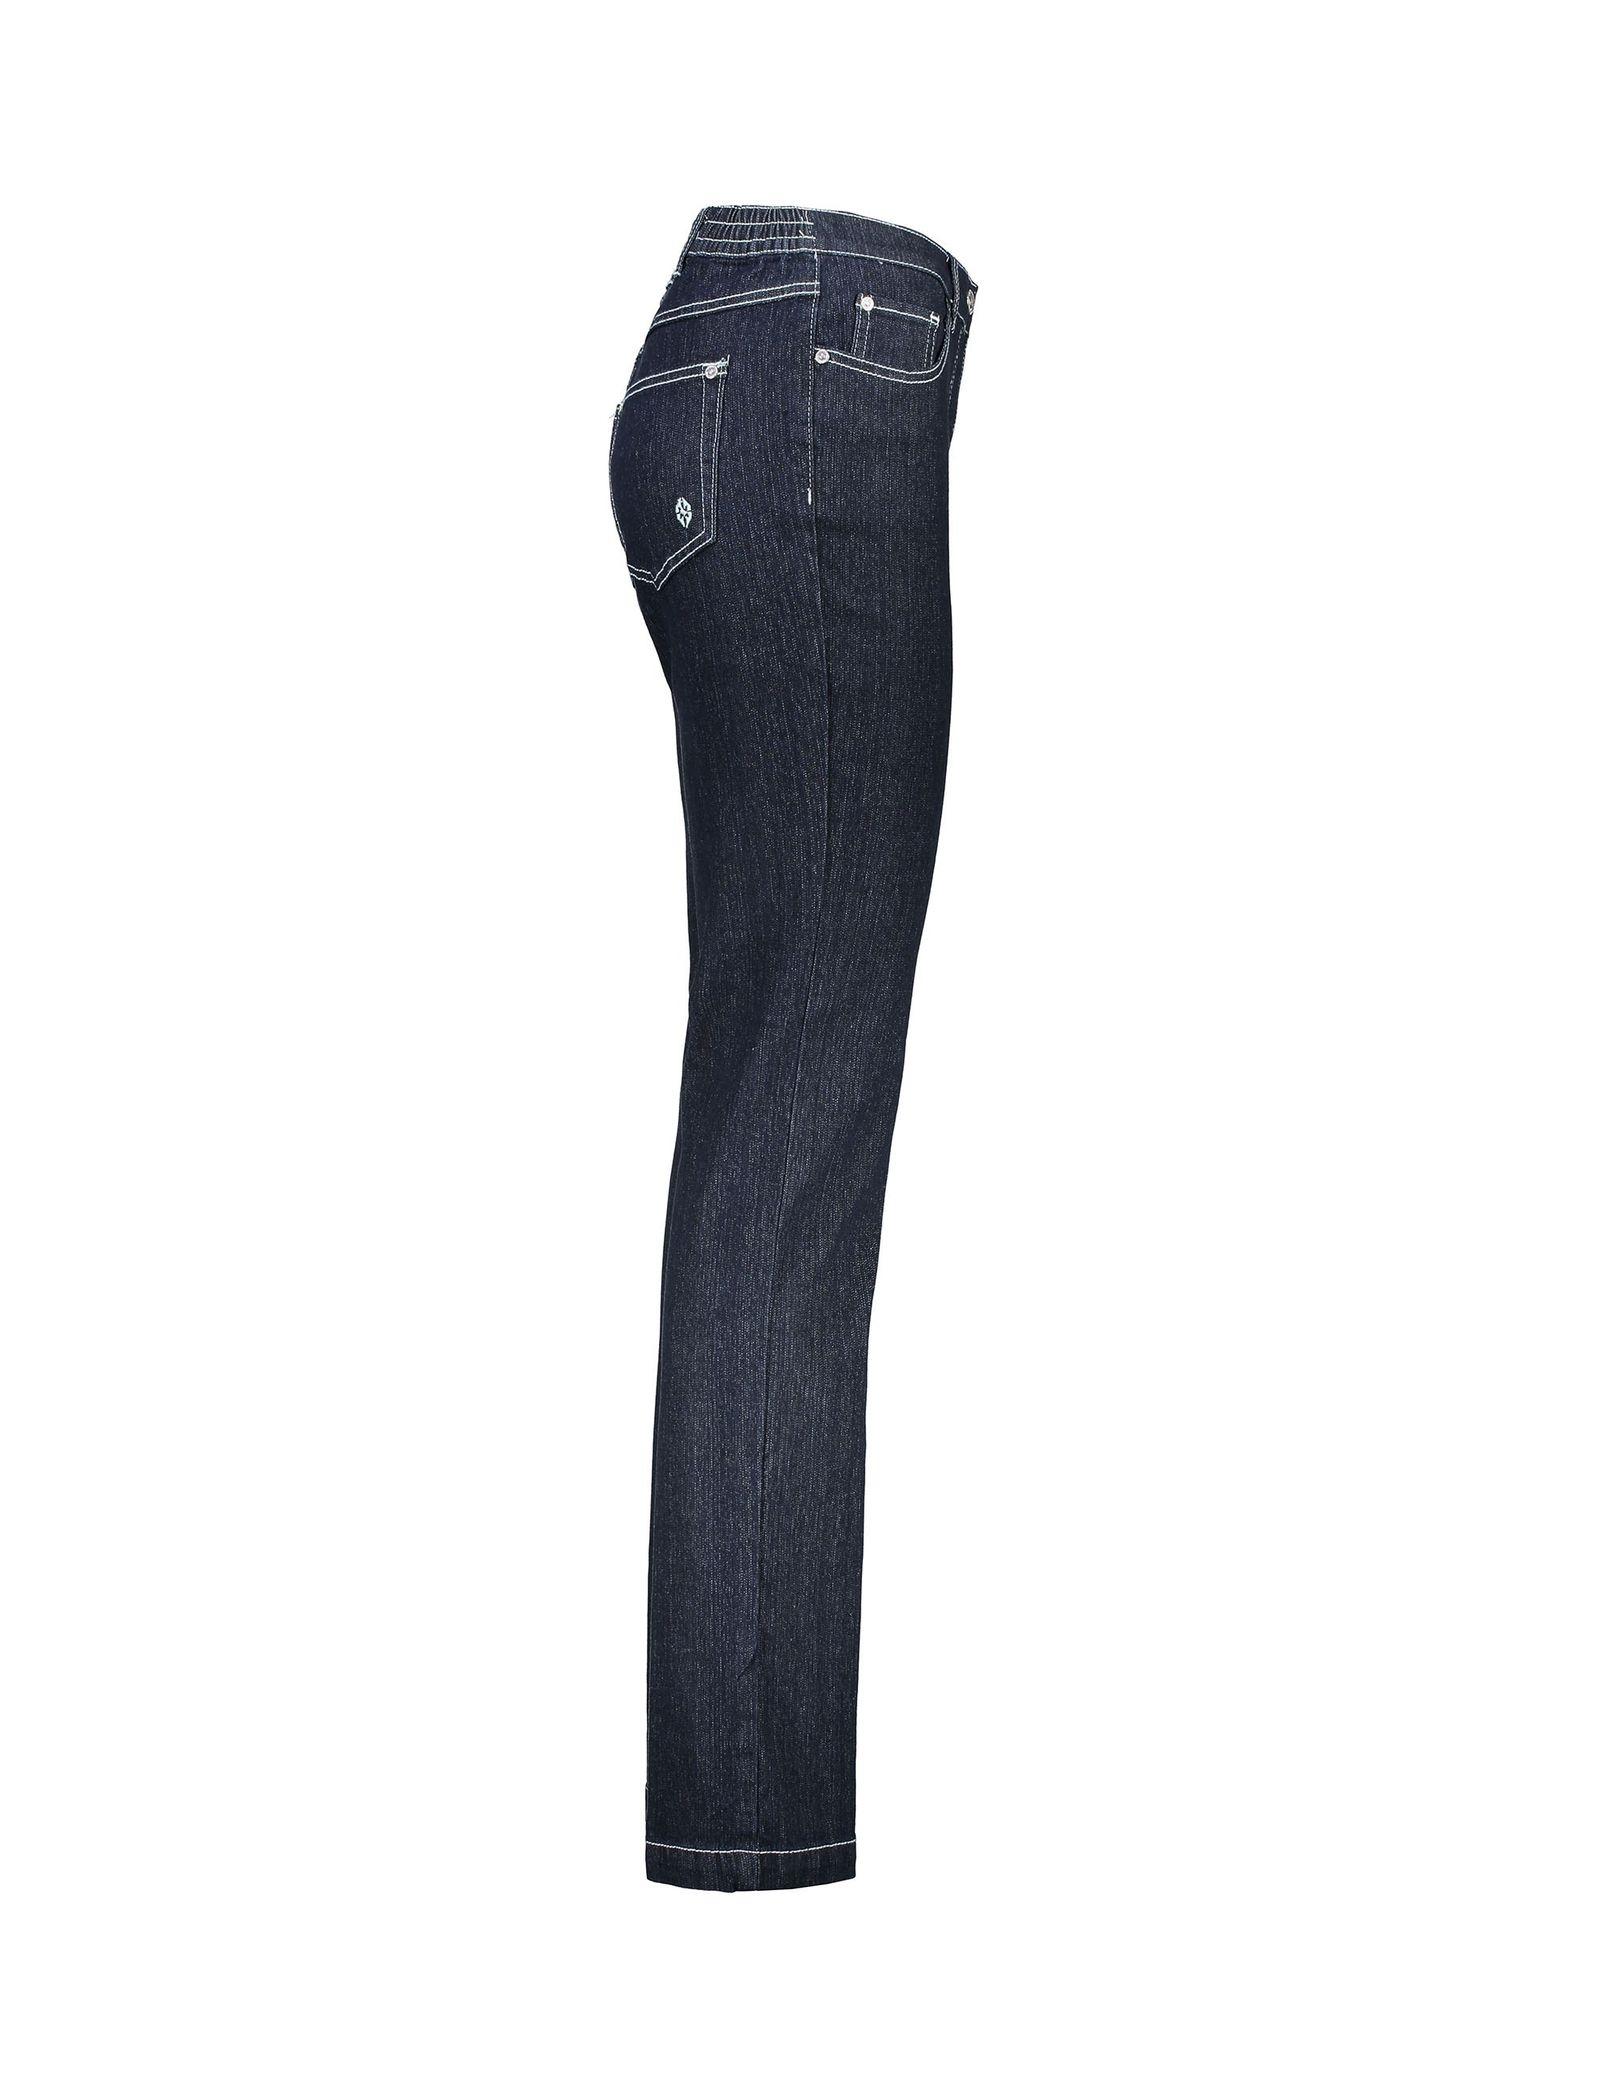 شلوار جین راسته زنانه - پونت روما - جين - 3